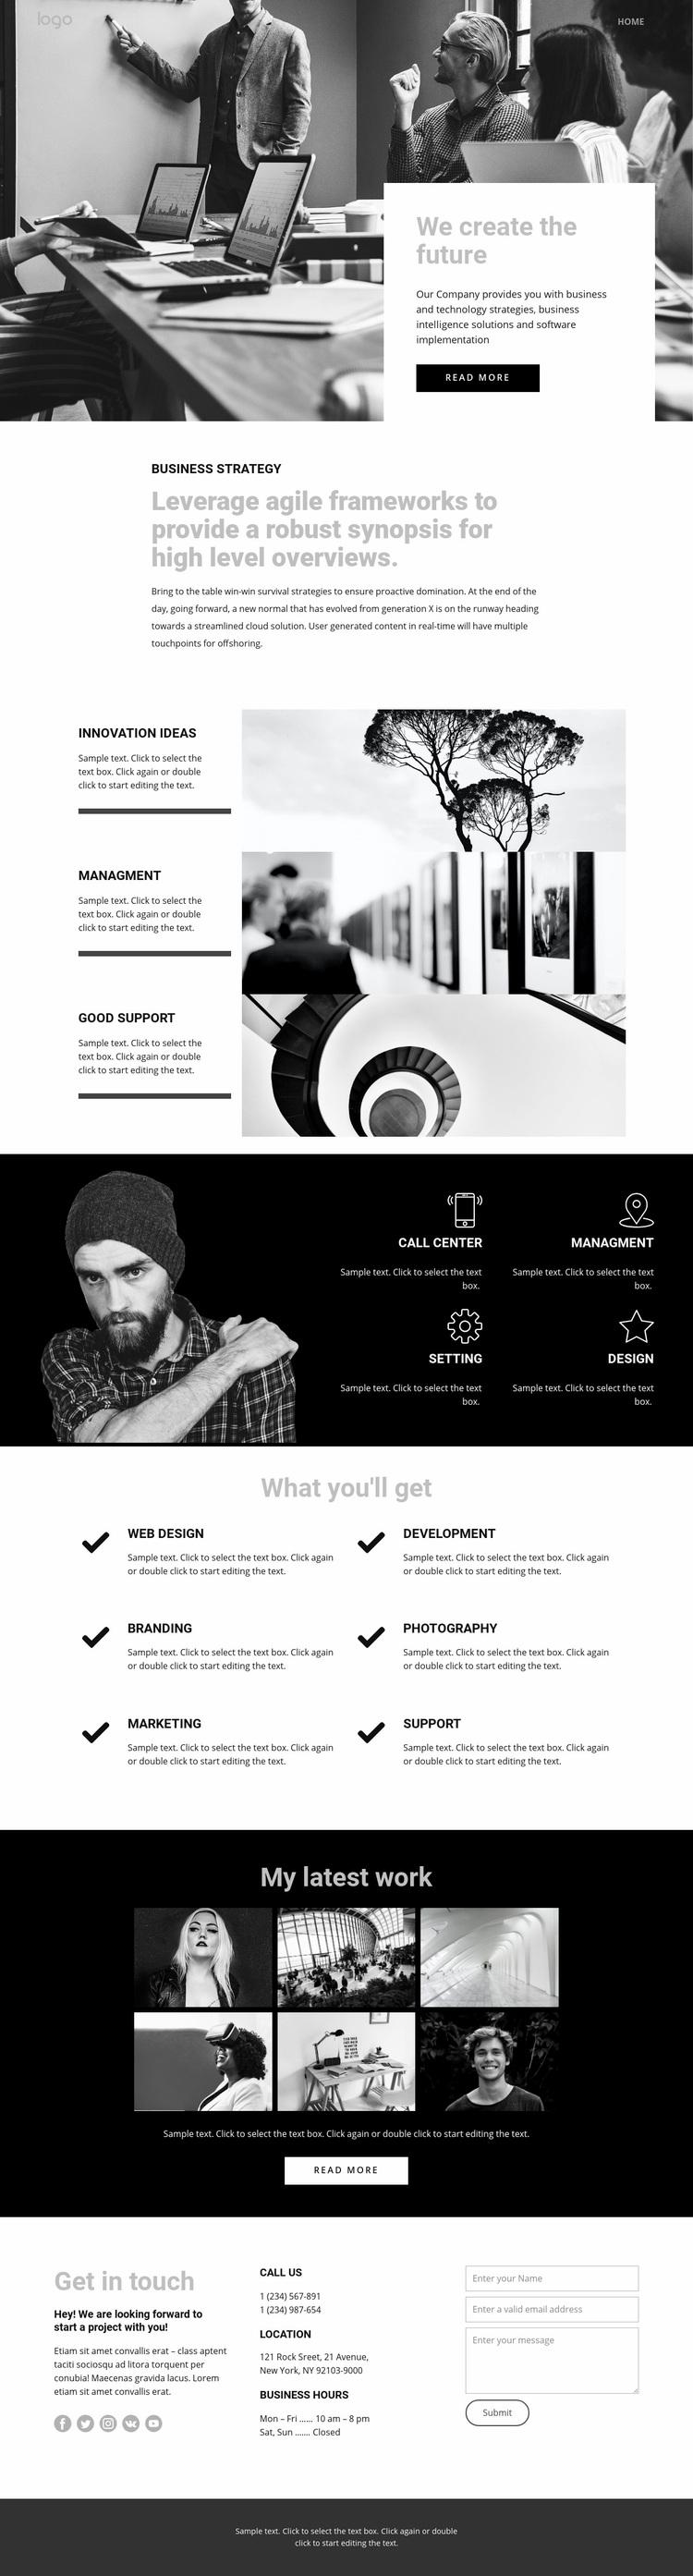 Future of corporate business Web Page Designer